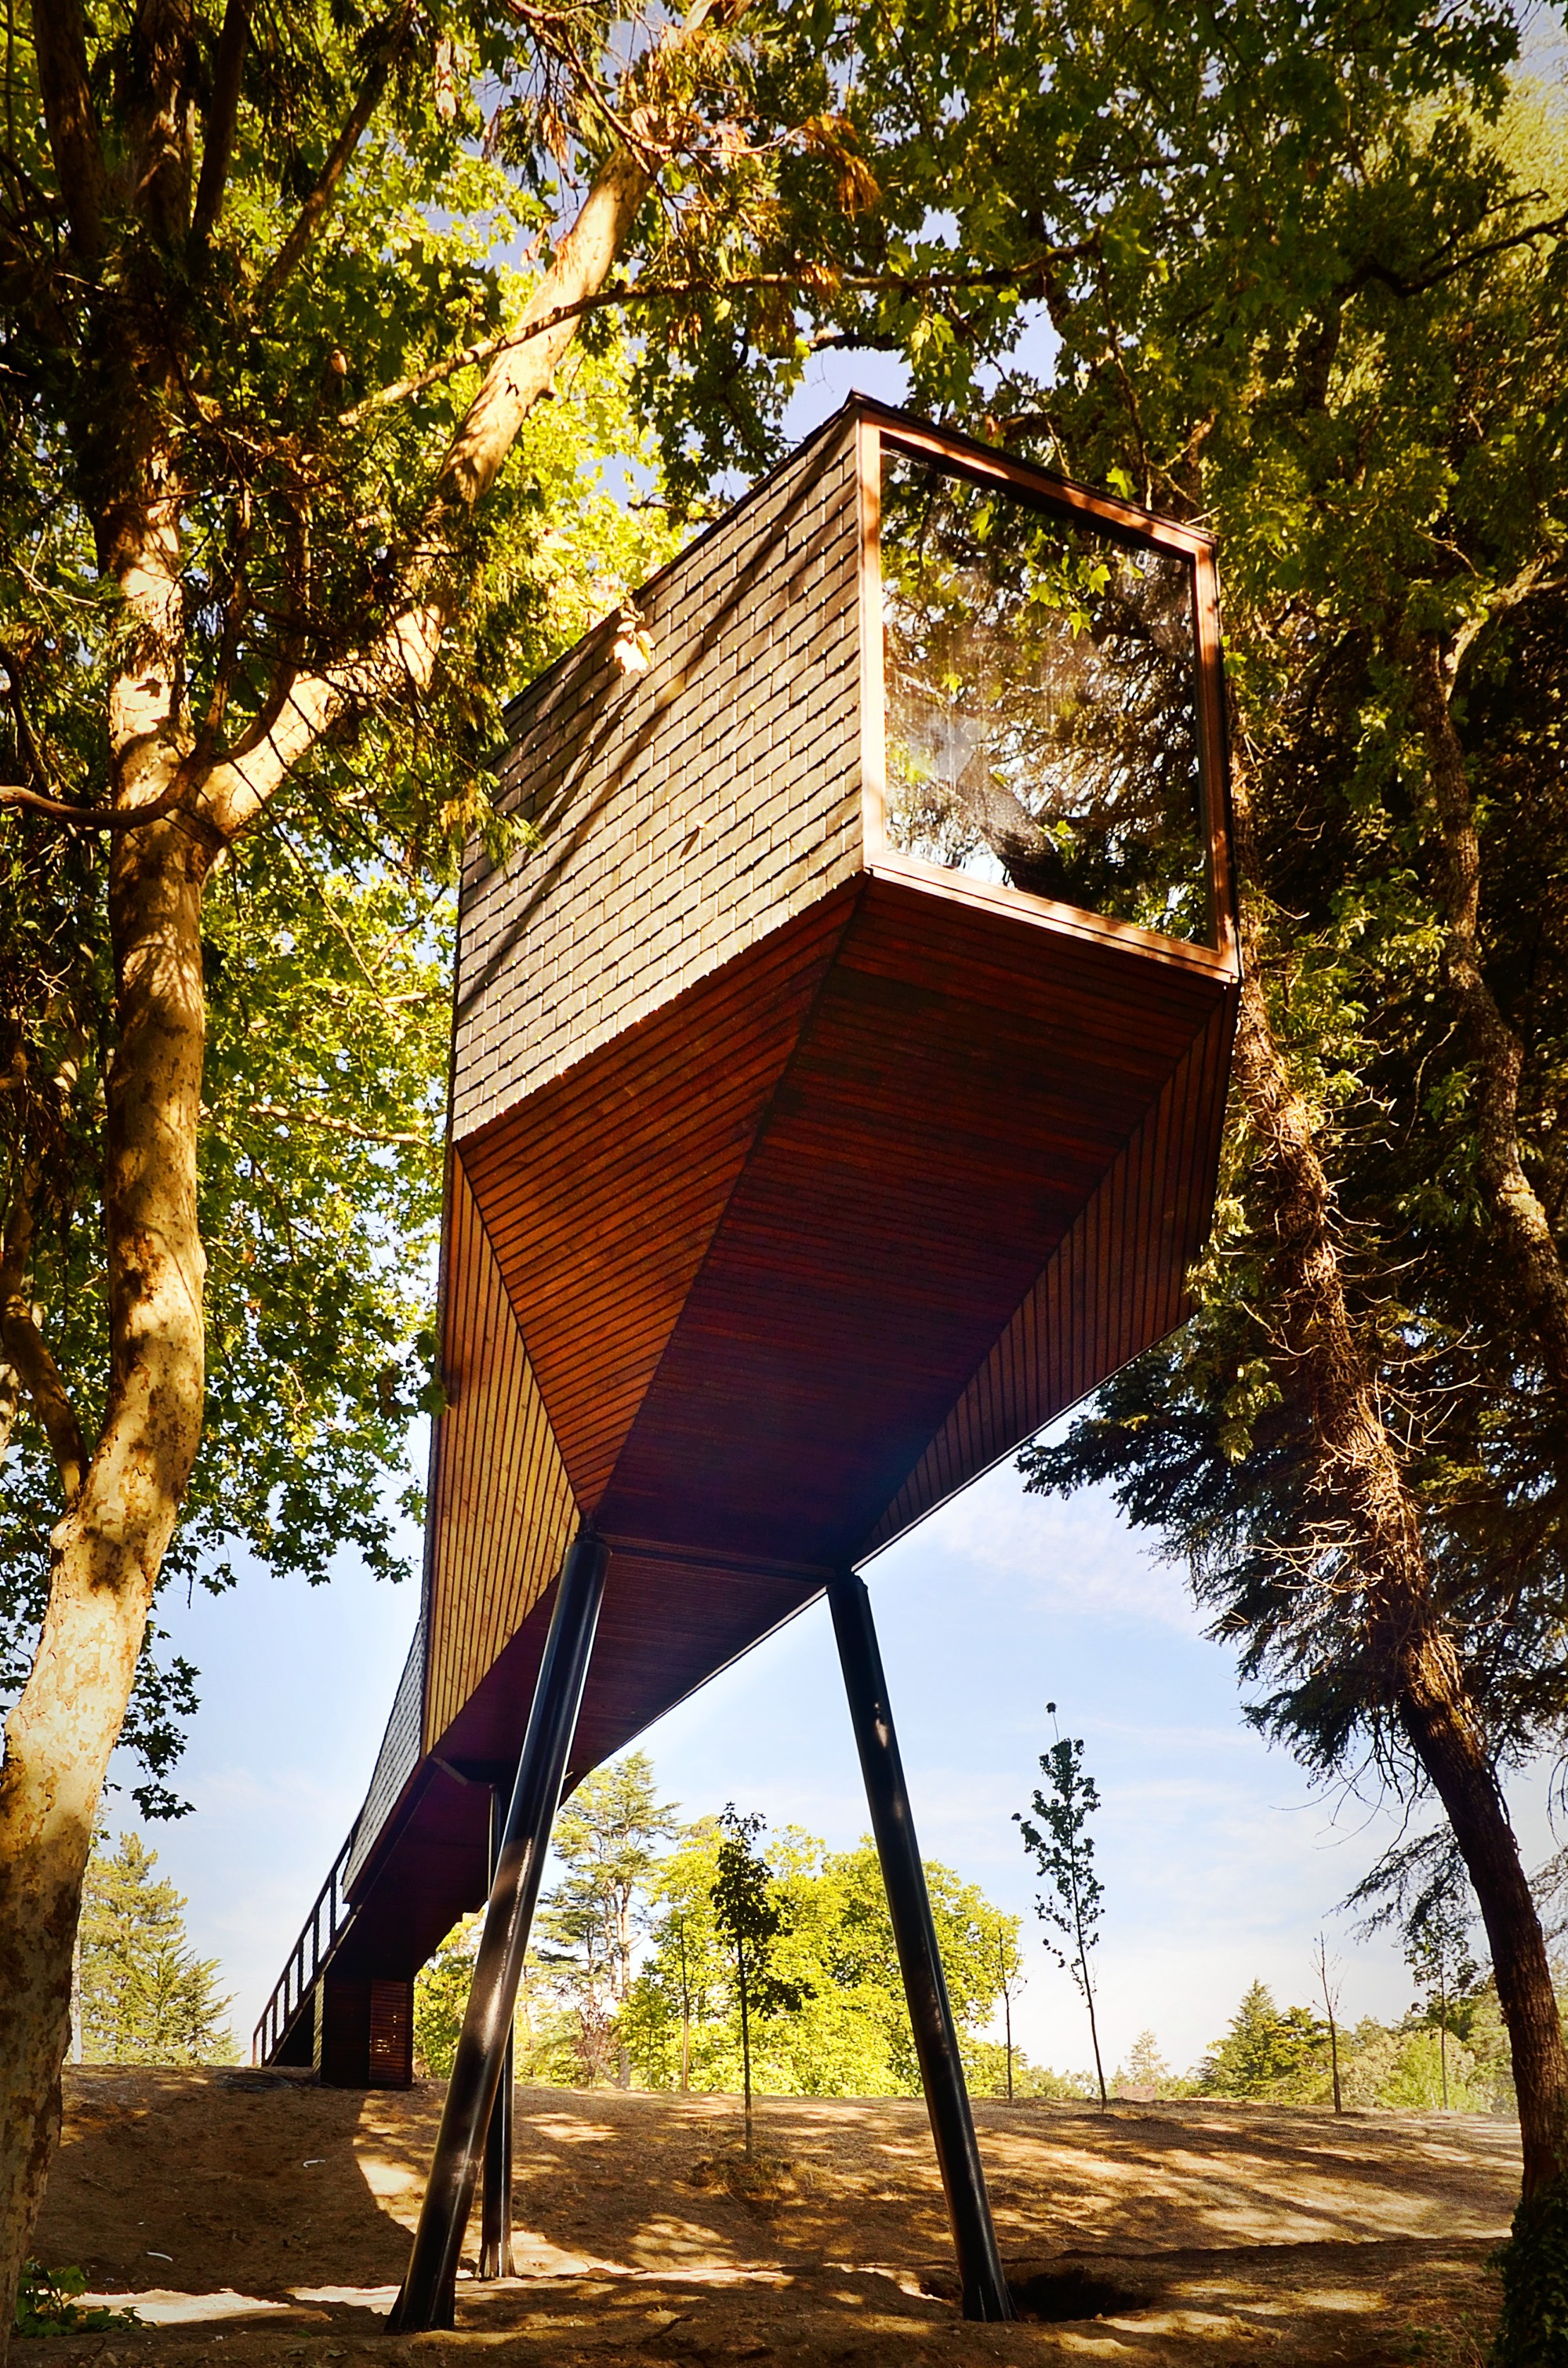 Tree snake houses lu s rebelo de andrade tiago rebelo - Maison tree snake houses luis tiago rebelo andrade ...